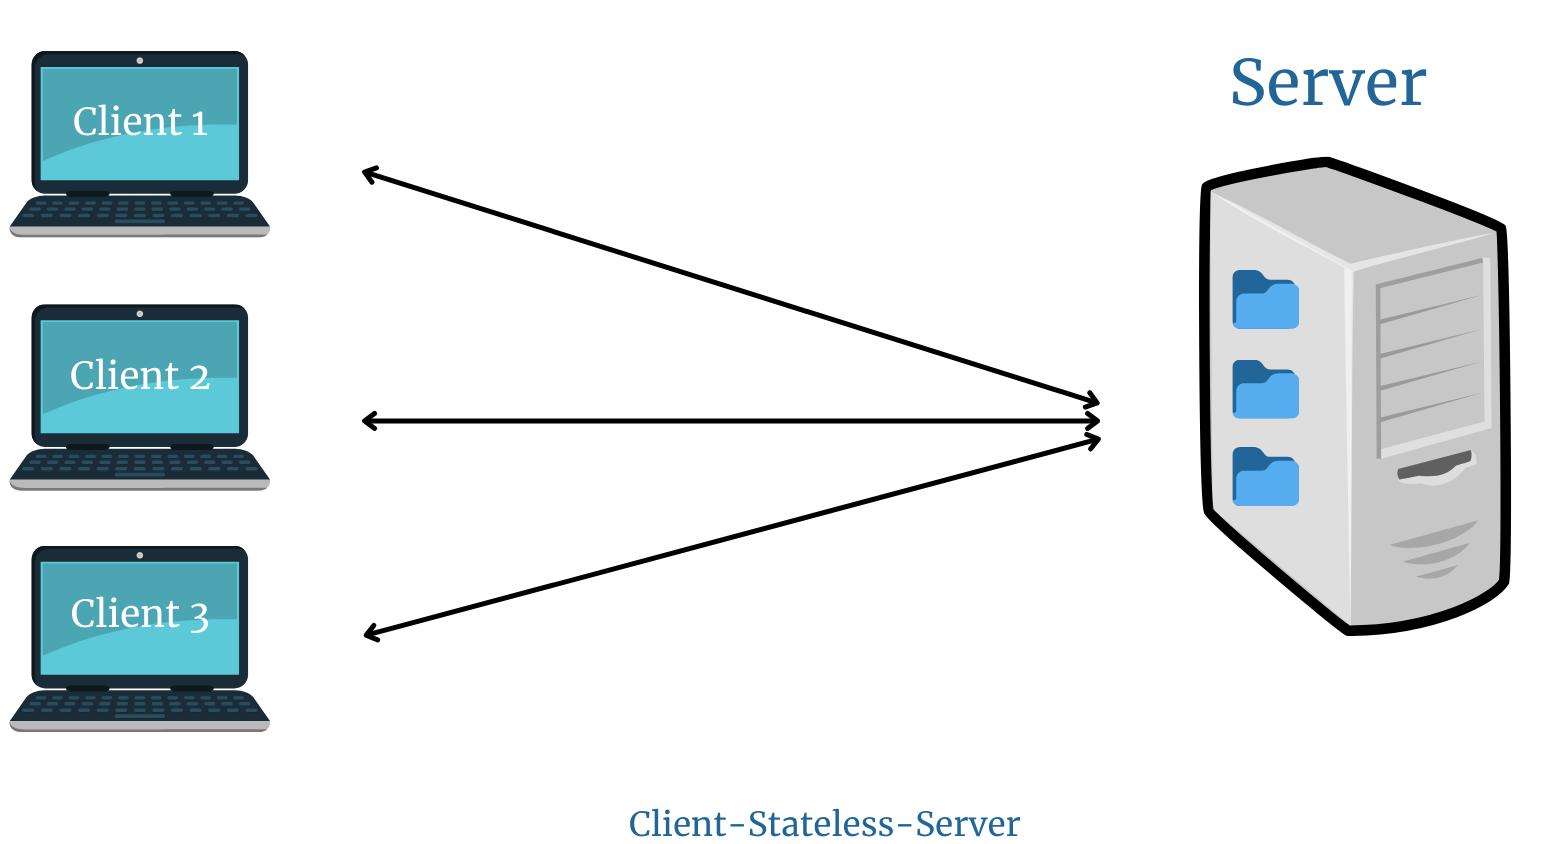 Client-Stateless-Server | REST